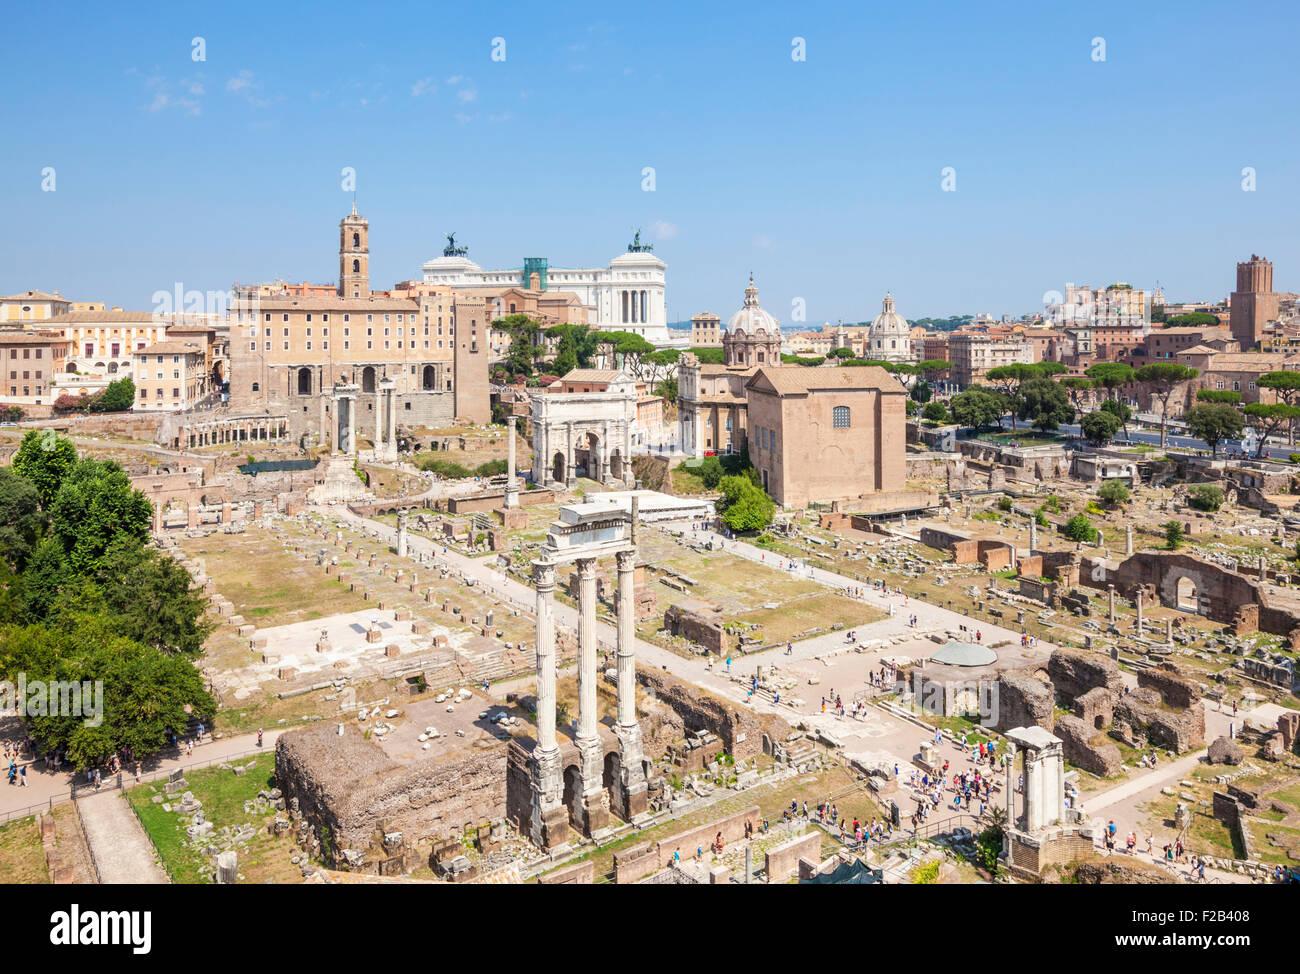 Roman Forum and Rome Skyline from the Palatine Hill viewpoint Rome Italy Roma Lazio  Italy EU Europe - Stock Image